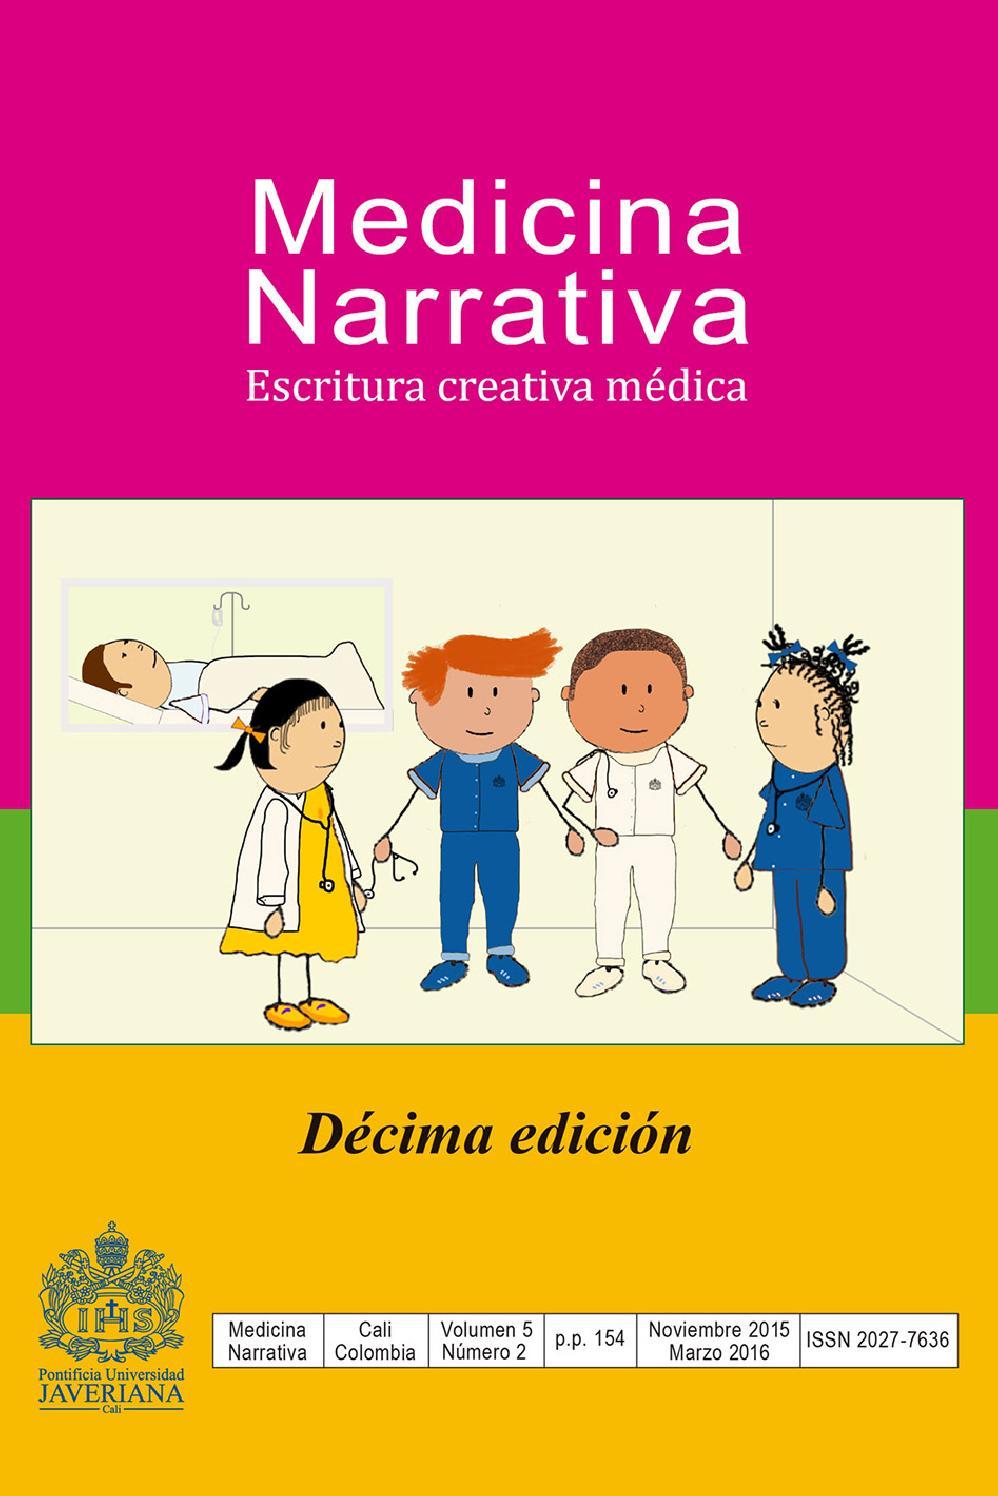 Revista de Medicina Narrativa Pontificia Unviersidad Javeriana Cali ...